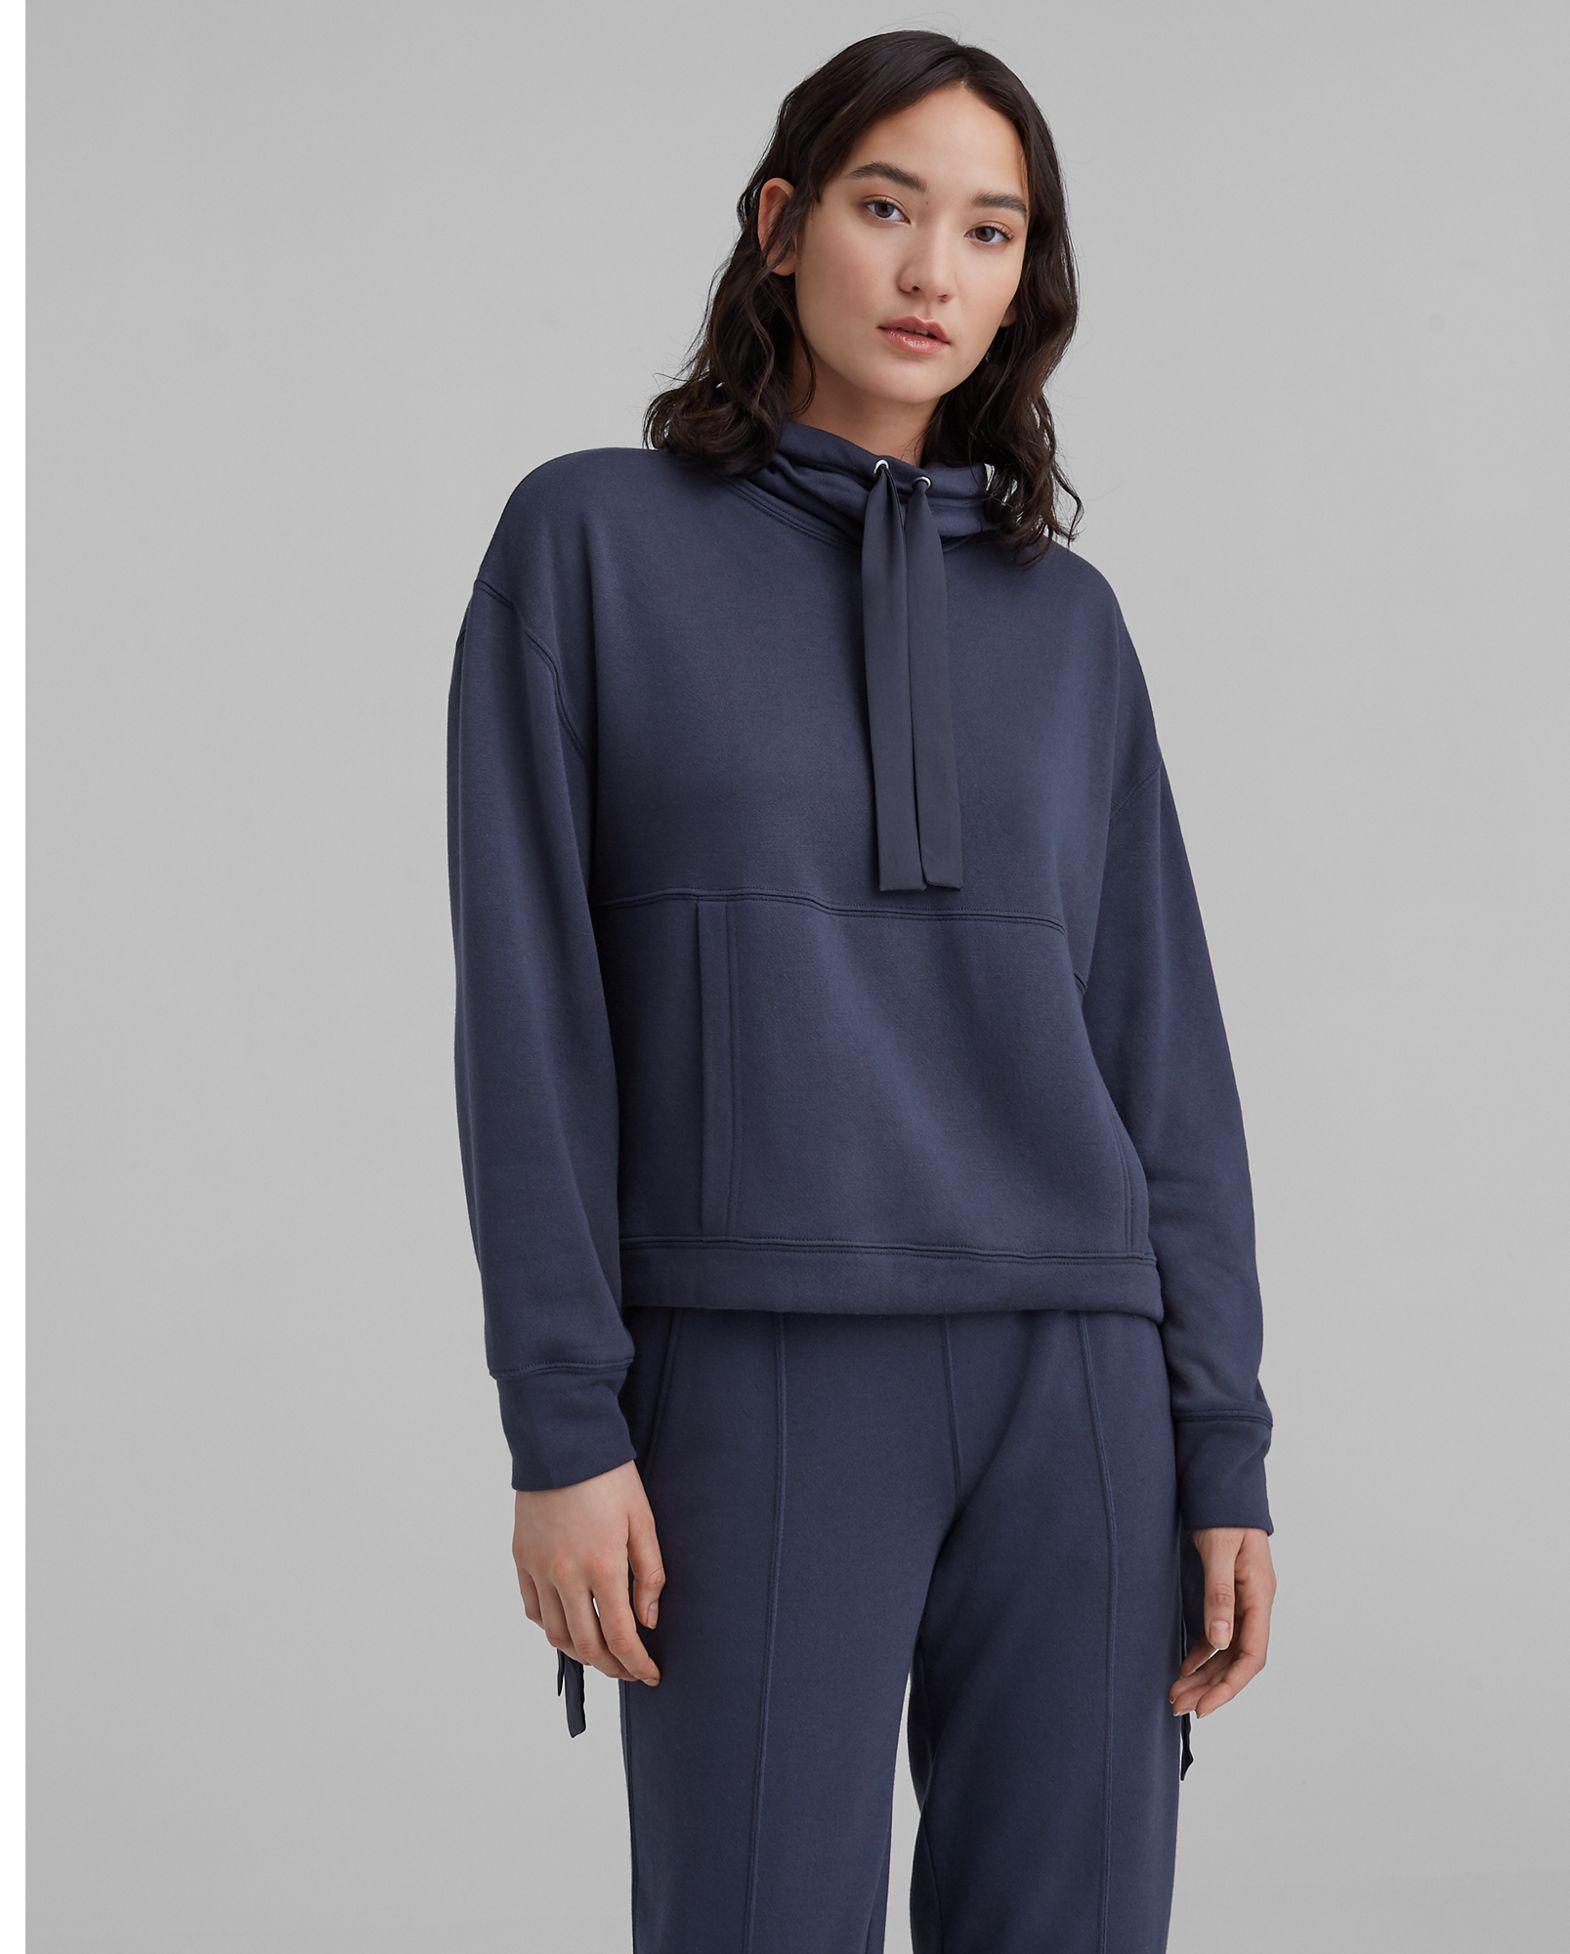 CLUB MONACO Harvee Sweatshirt